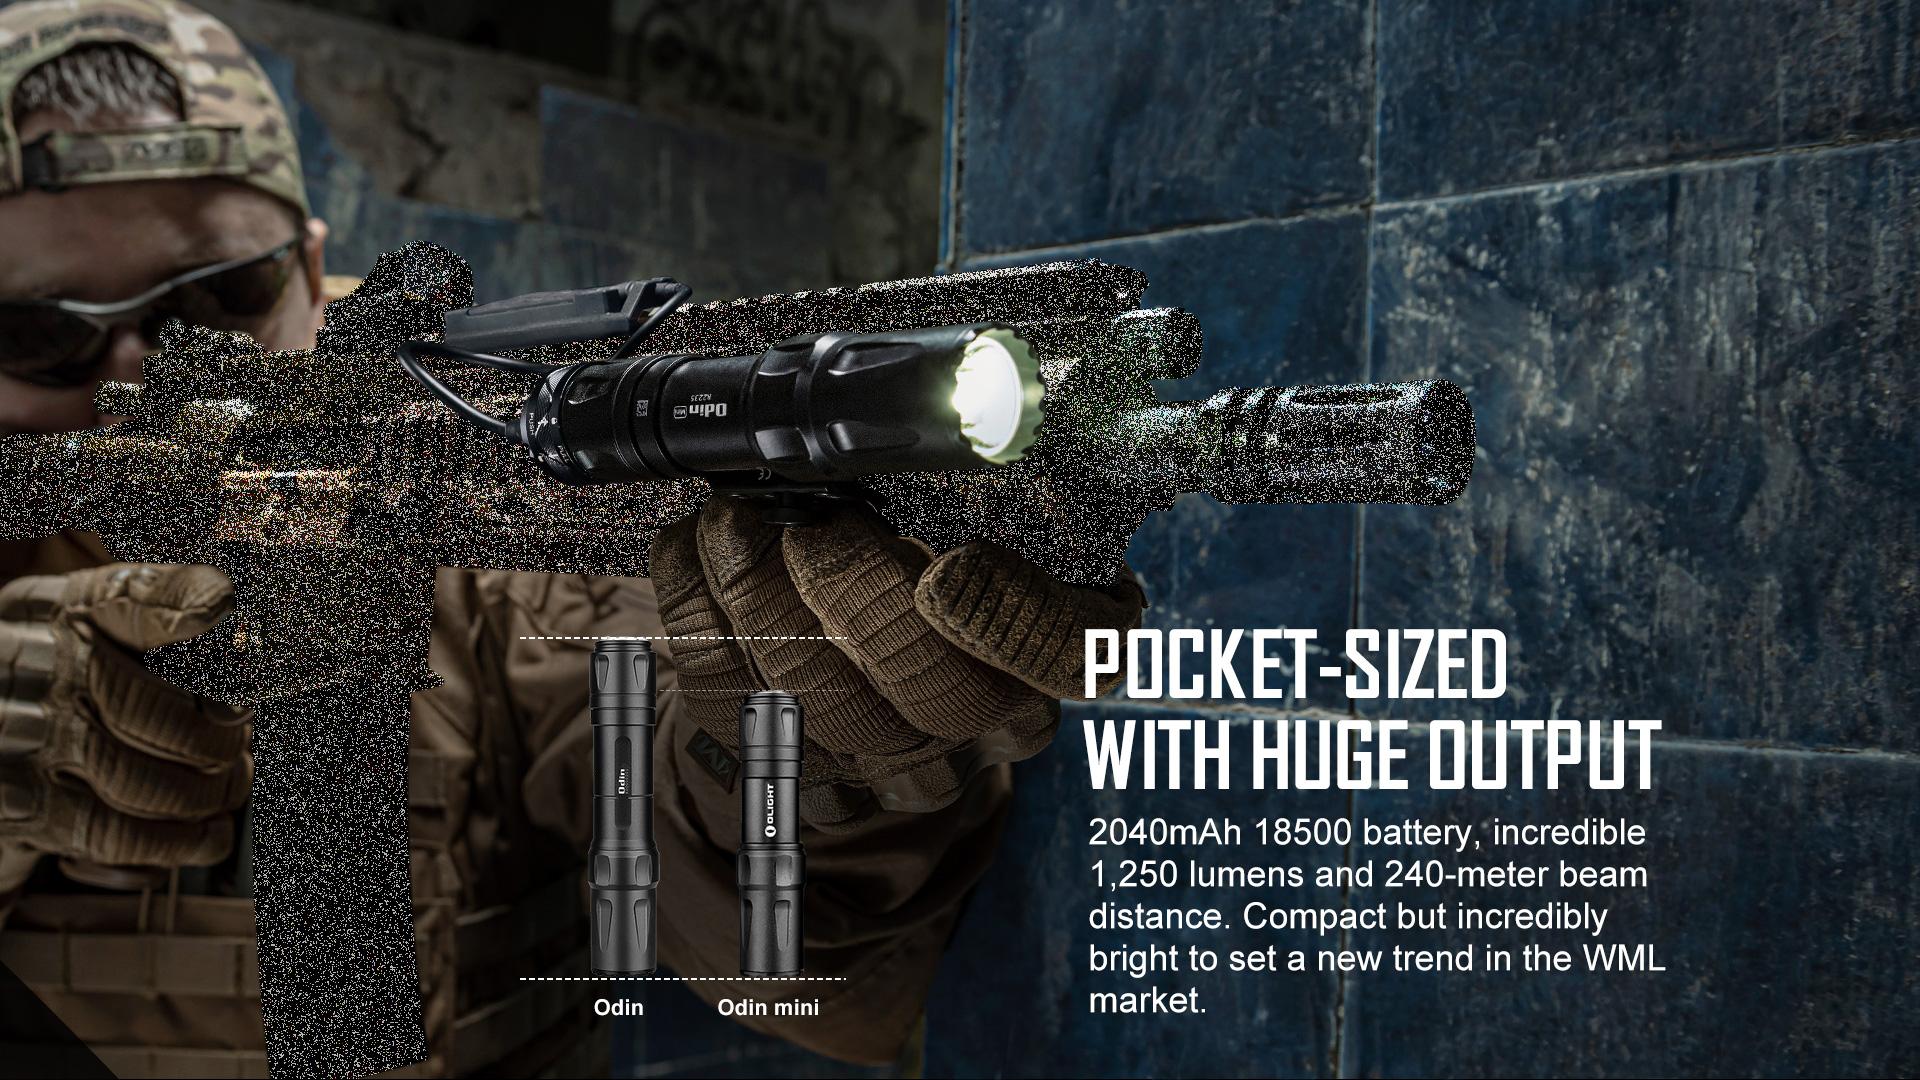 Odin Mini tactical flashlight 1250 lumens